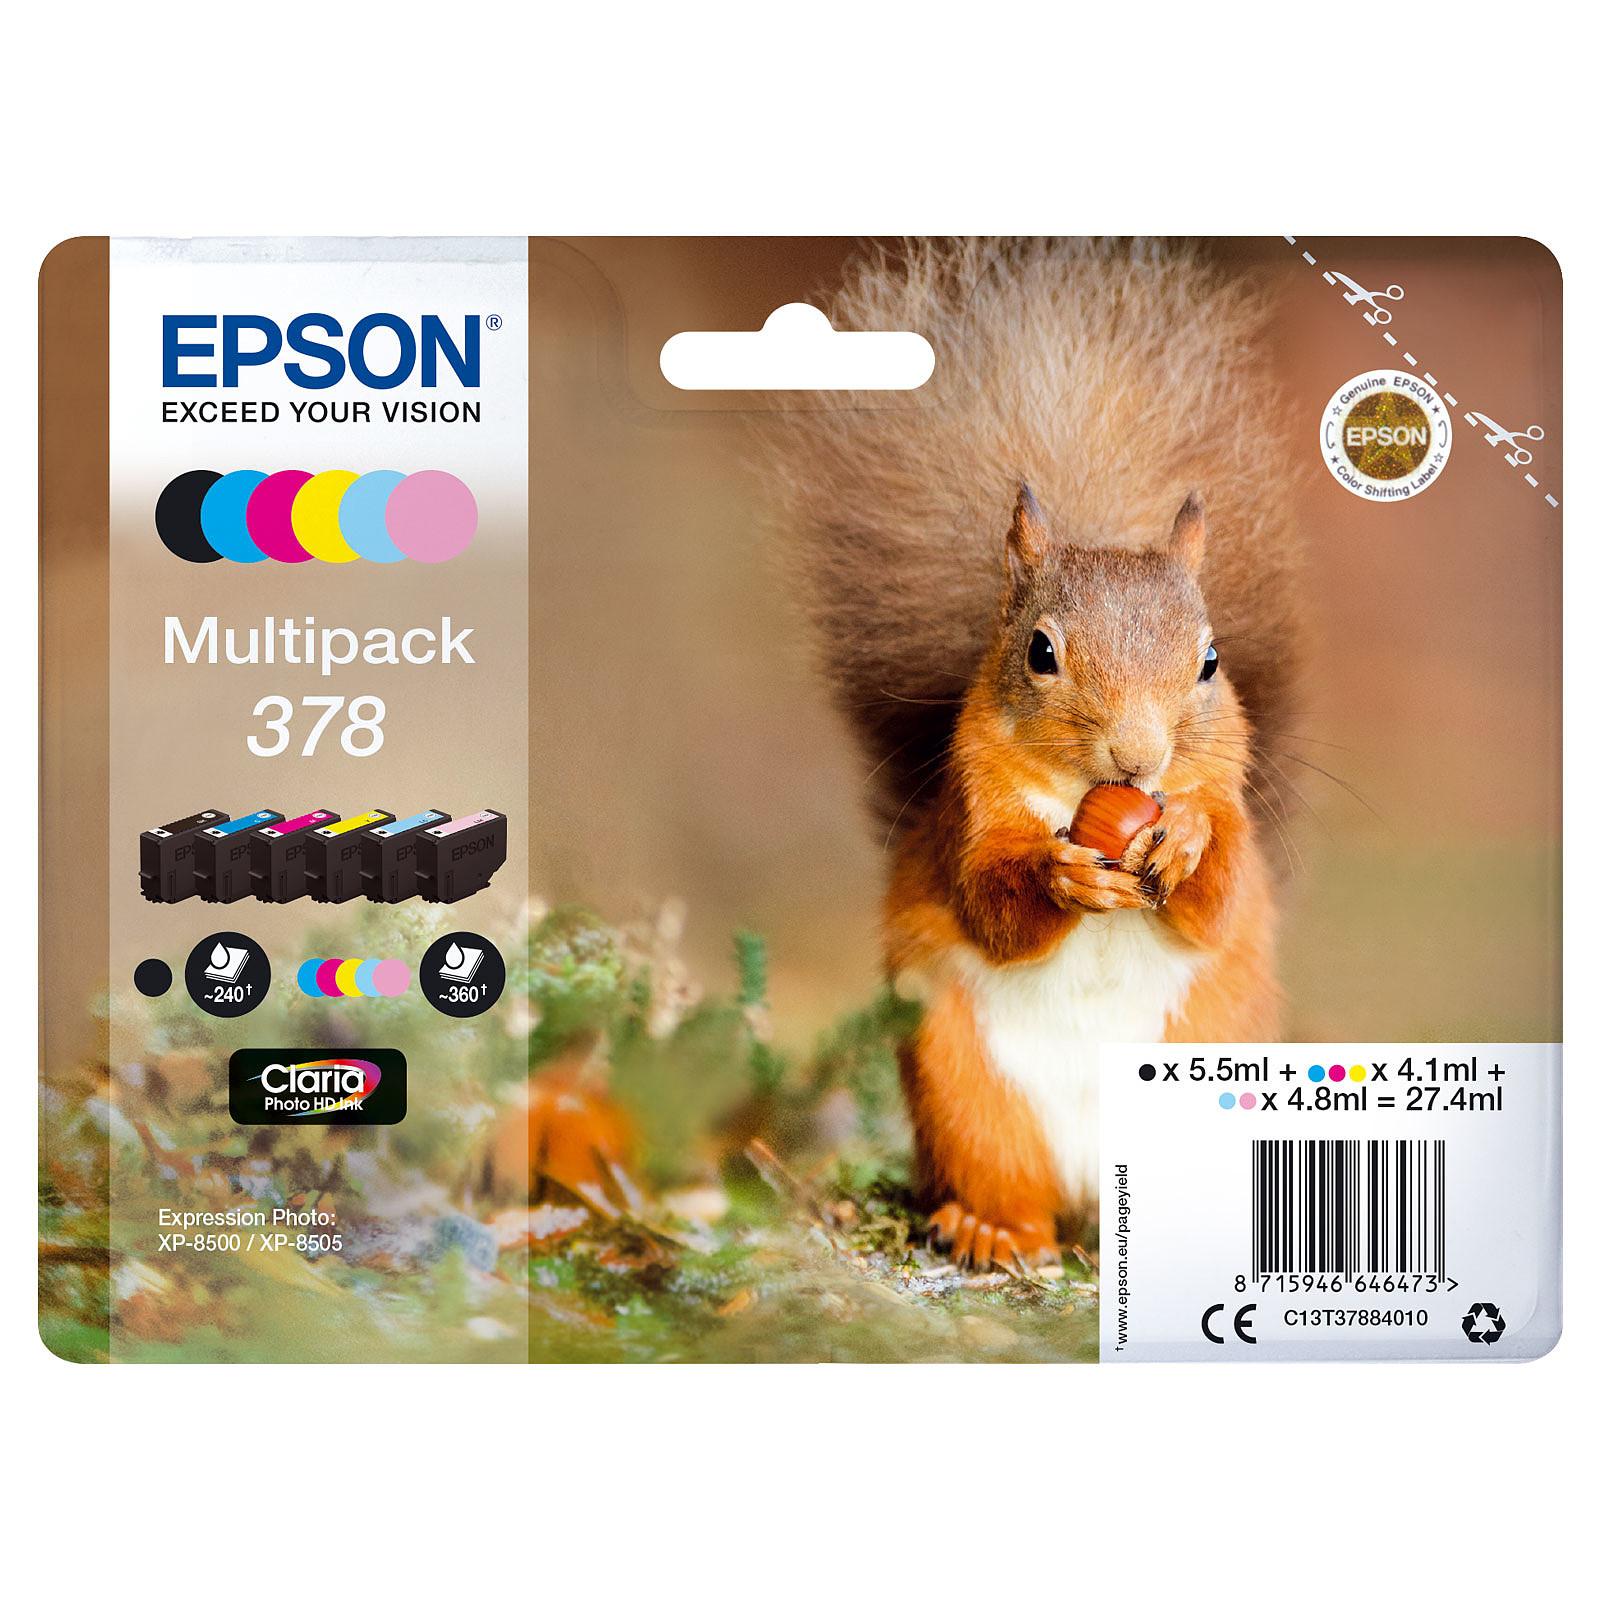 Epson Ecureuil Multipack 378